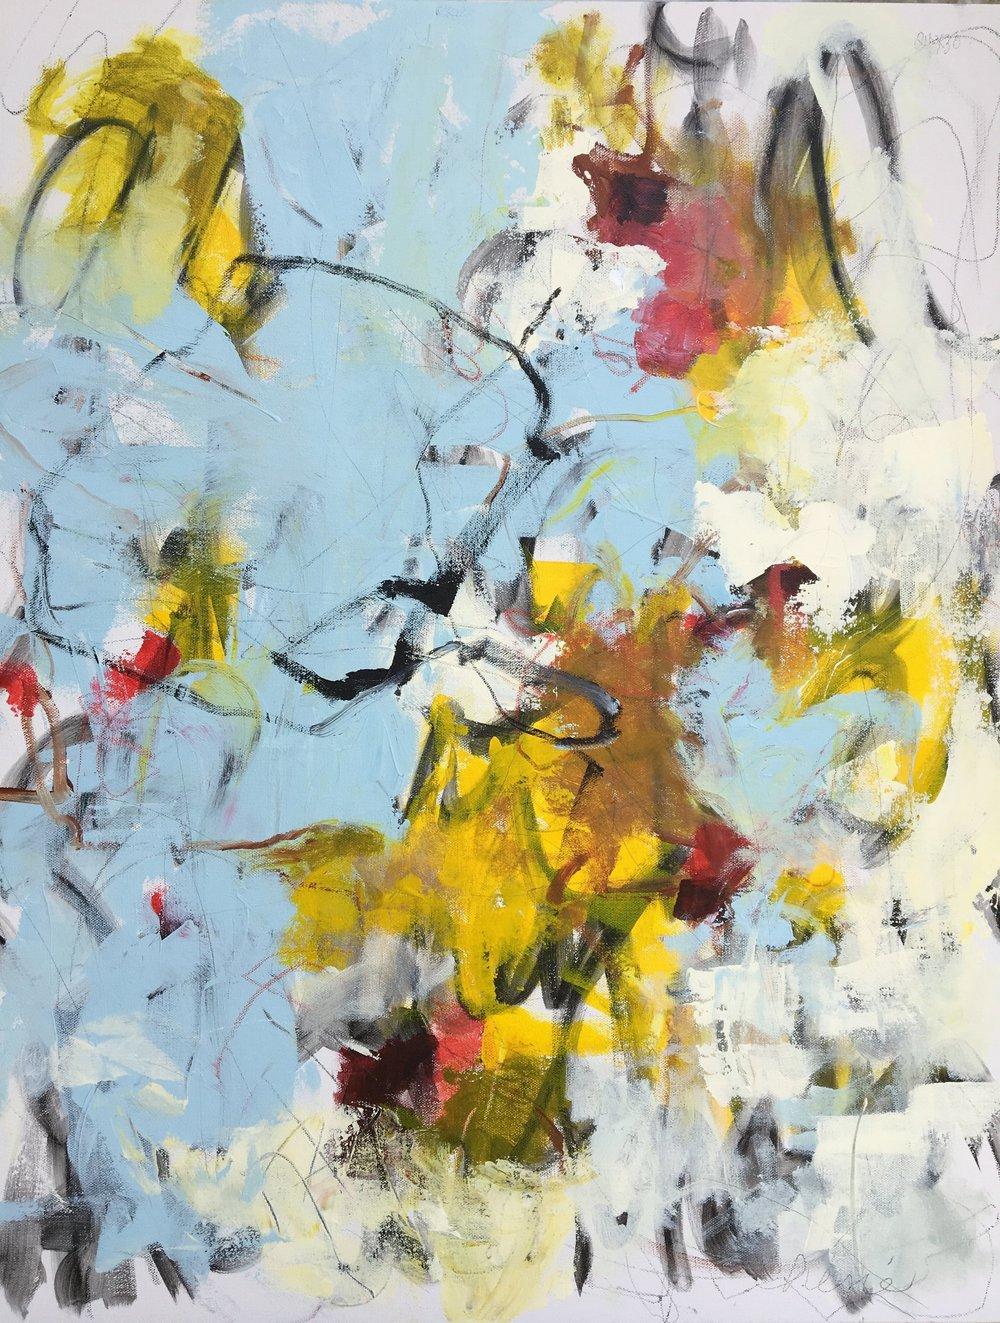 "24 X 30"" Original Abstract Acrylic on gallery wrap canvas."